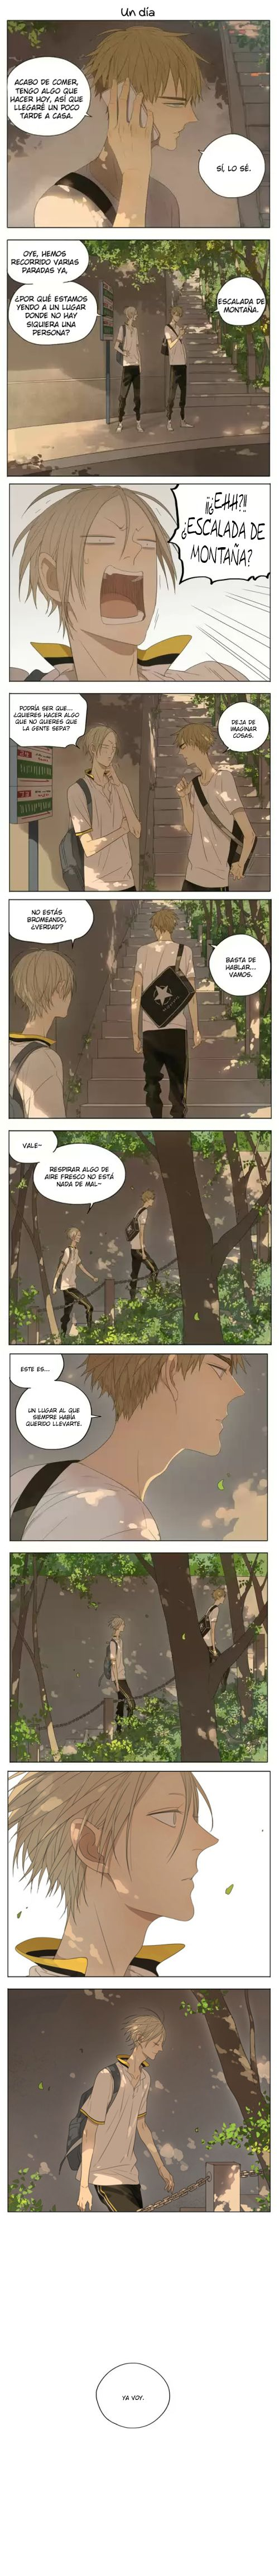 http://c5.ninemanga.com/es_manga/pic2/7/15943/518587/387e02e10694ac10252a1a3430cb44cc.jpg Page 6